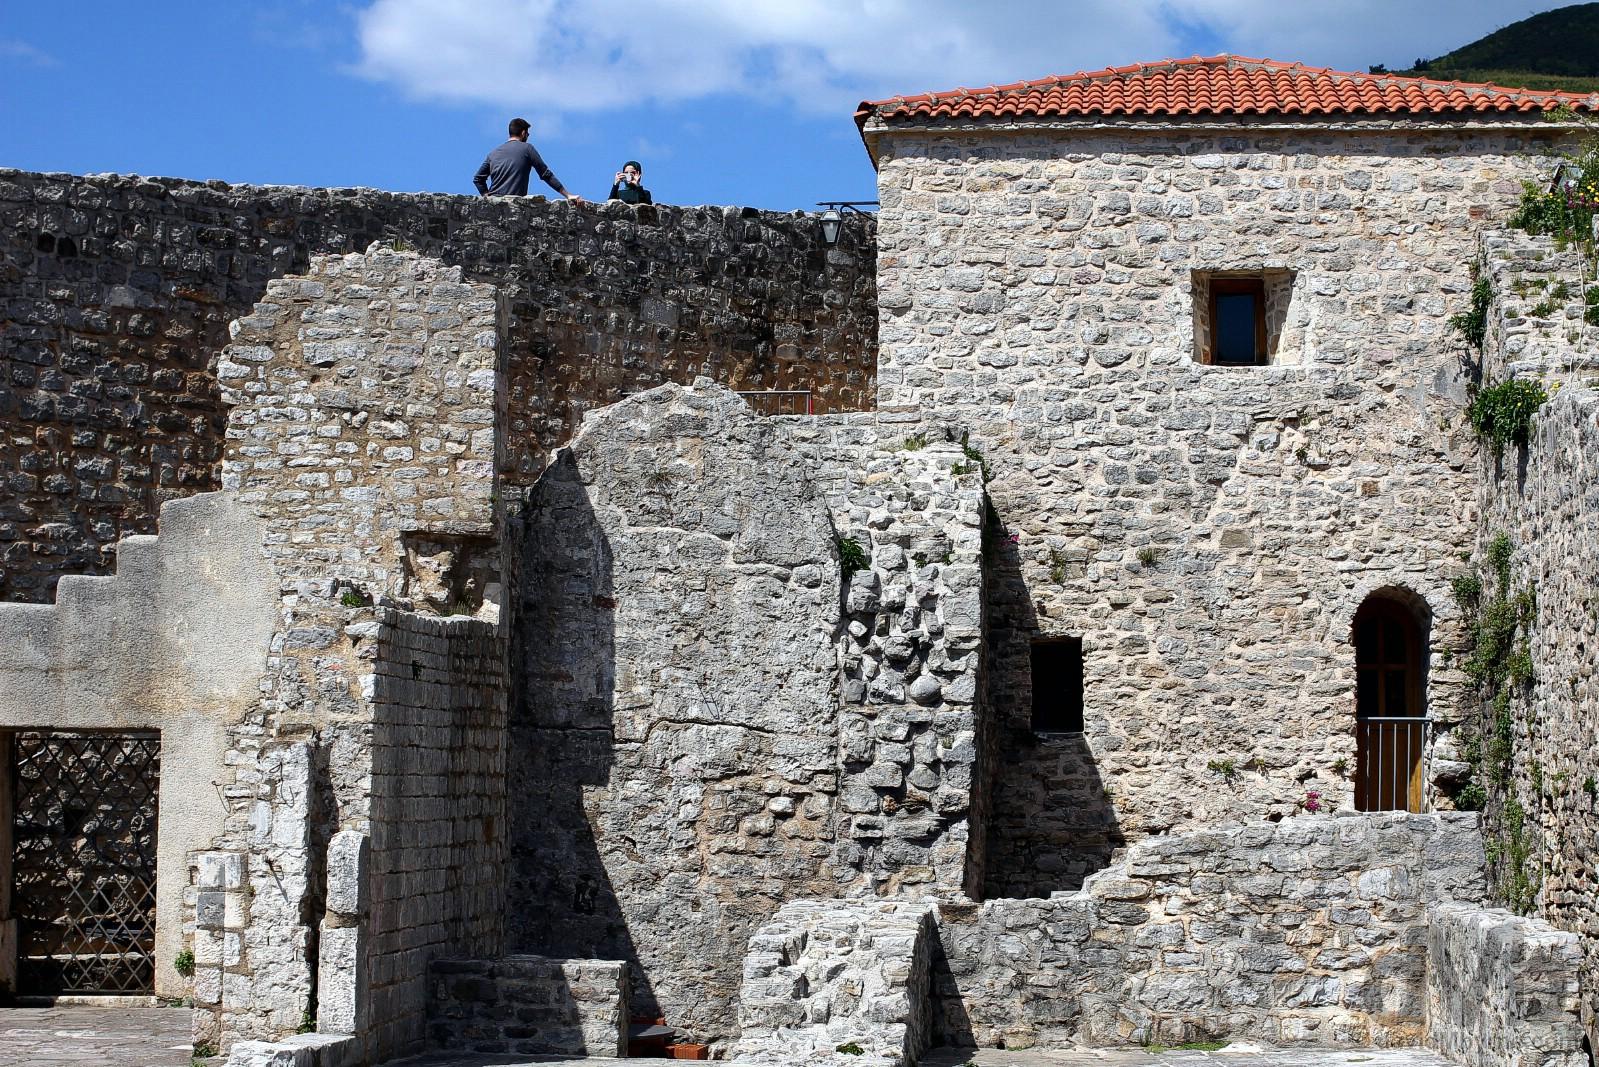 Citadela Fortress, Stari Grad (Old Town), Budva, Montenegro. April 21, 2017.